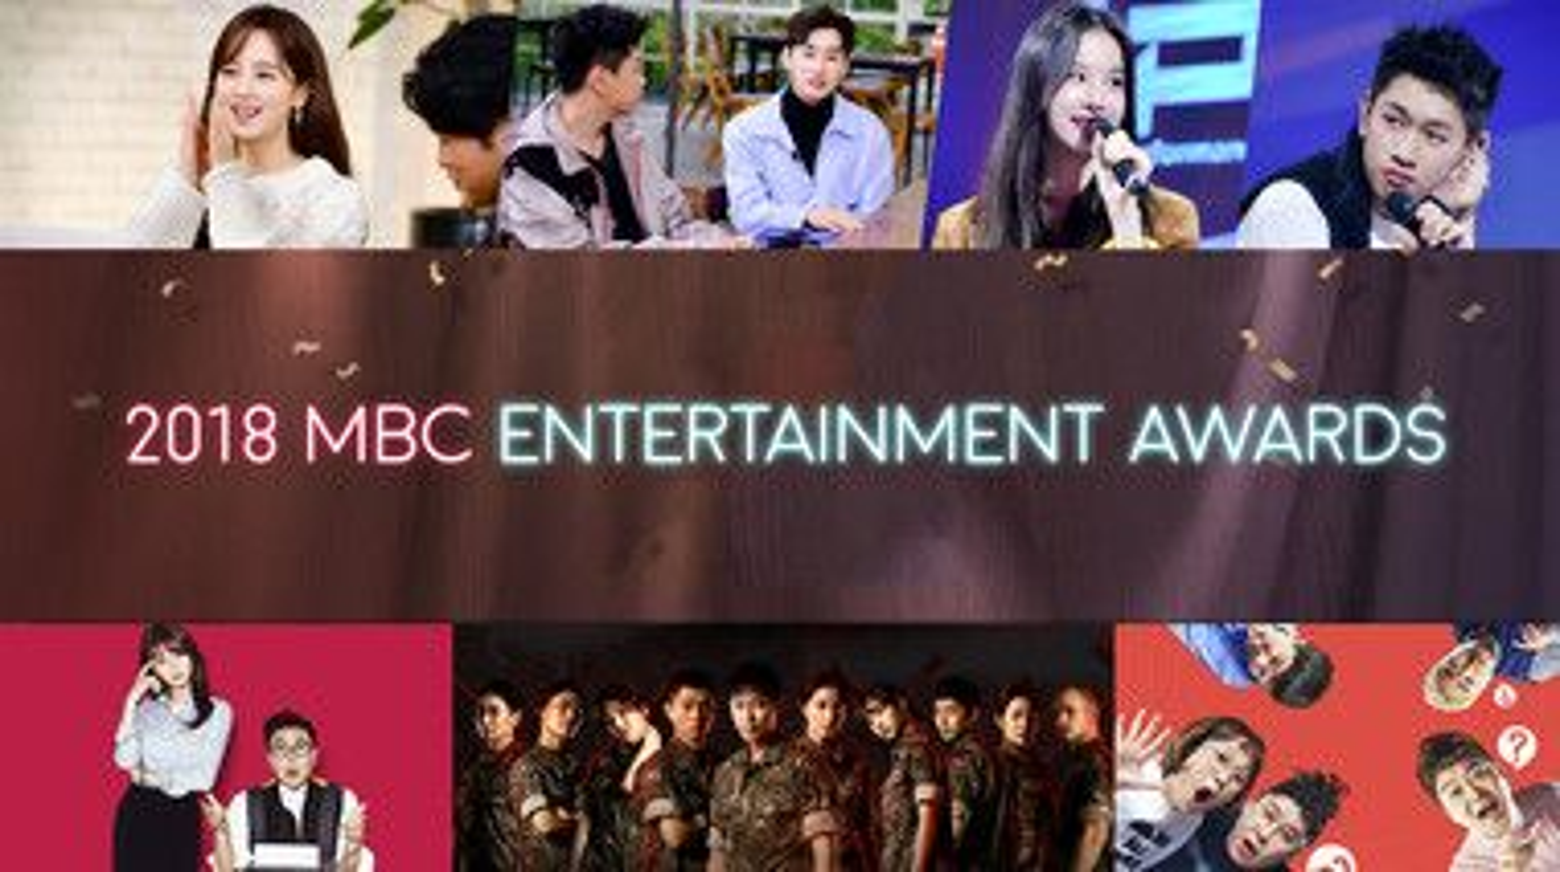 Prêmio de Entretenimento da MBC de 2018